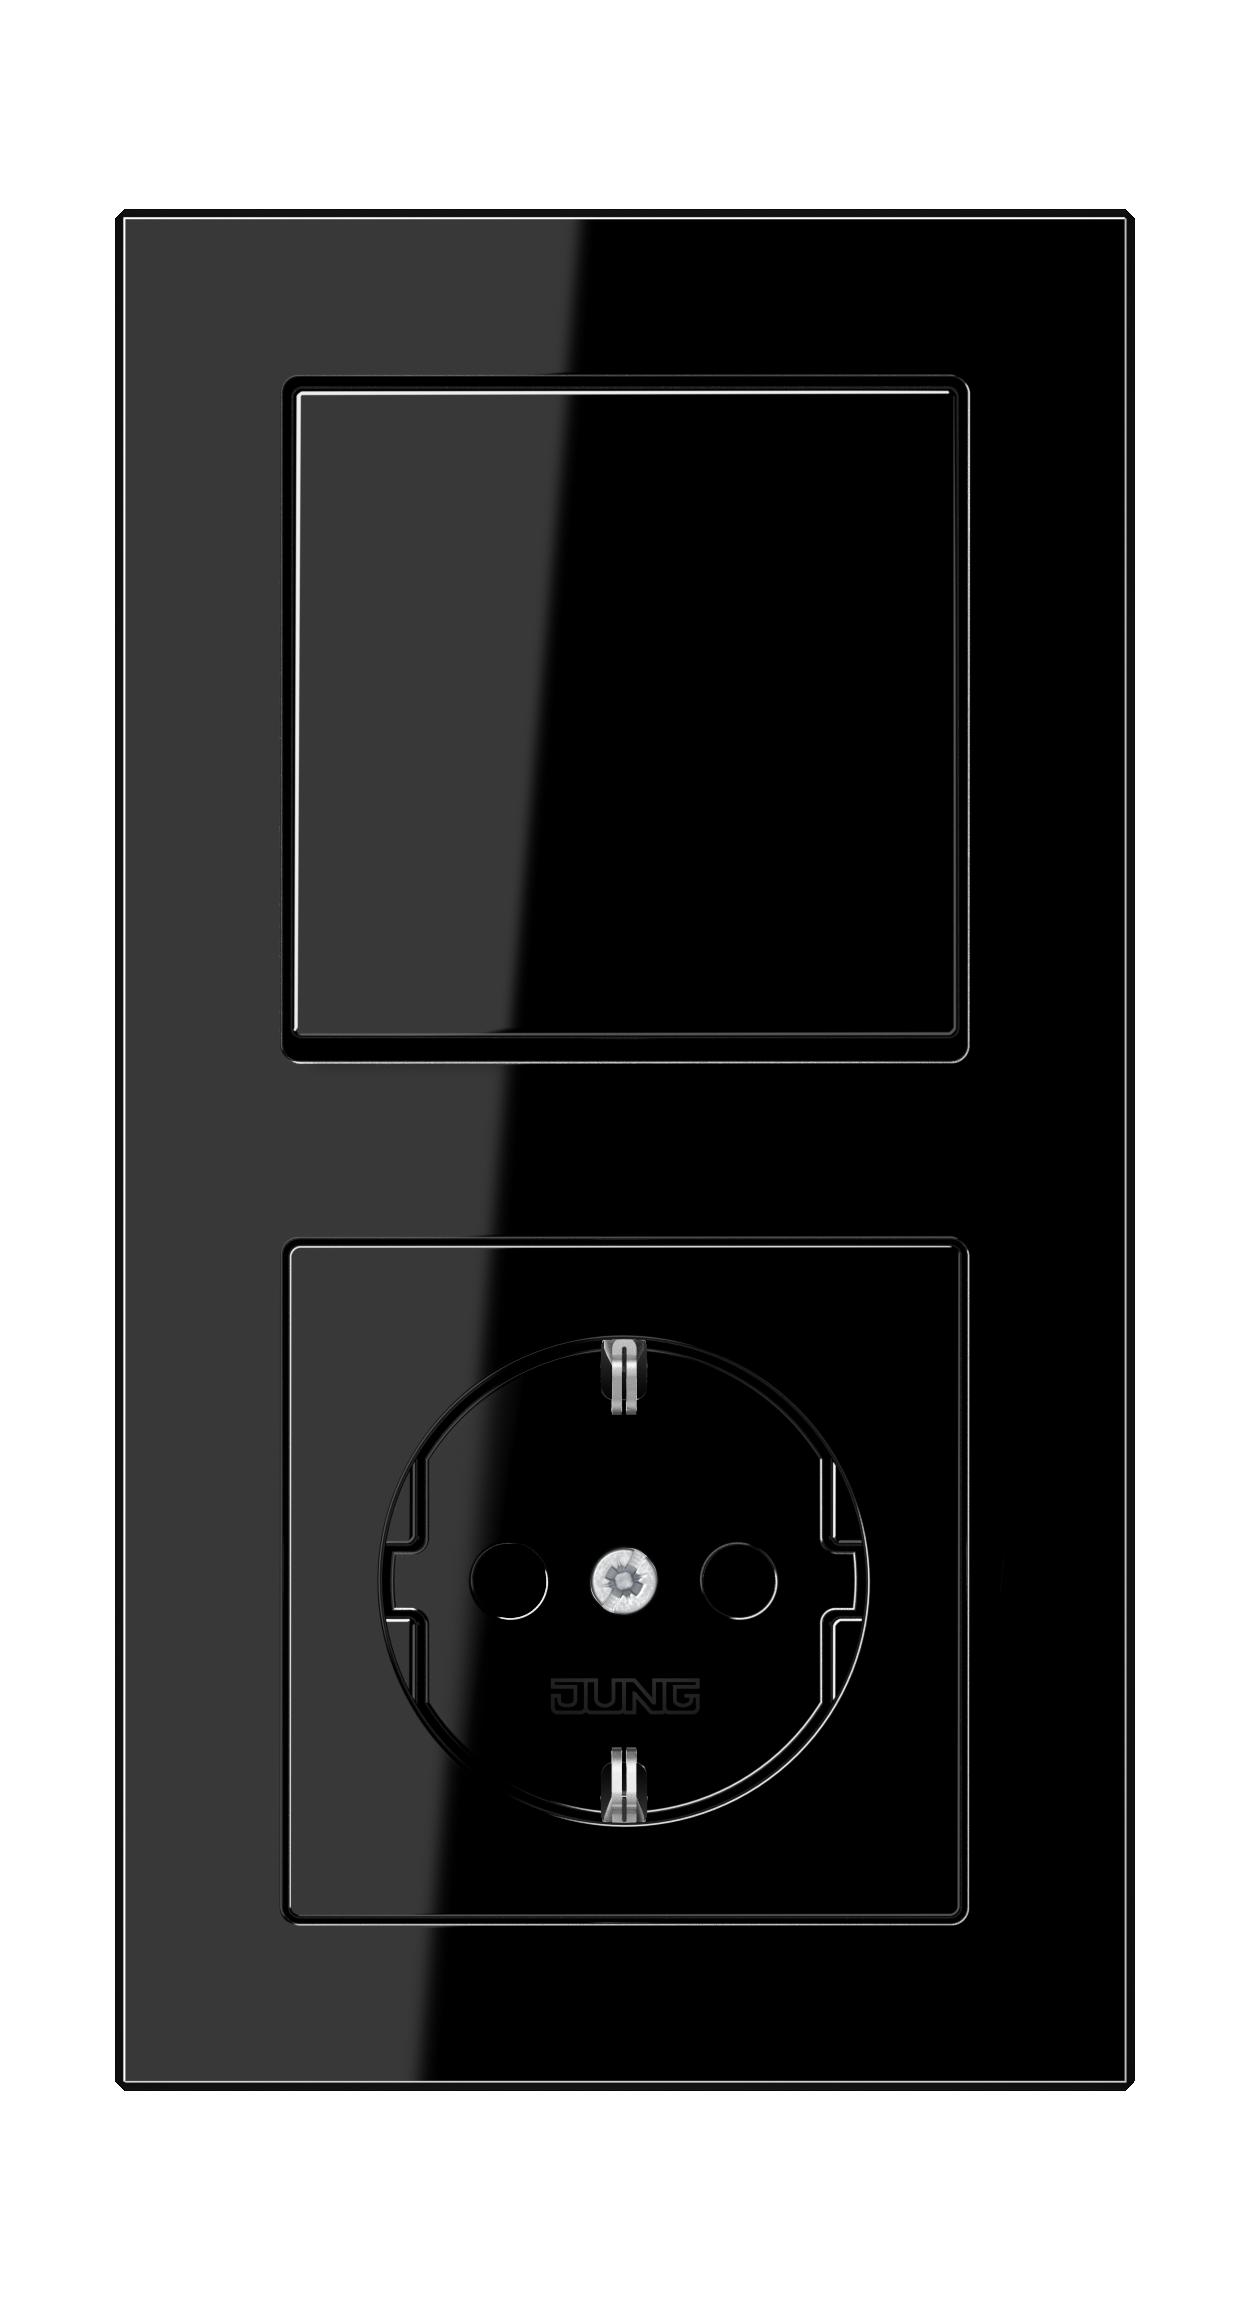 JUNG_AC_black_switch-socket